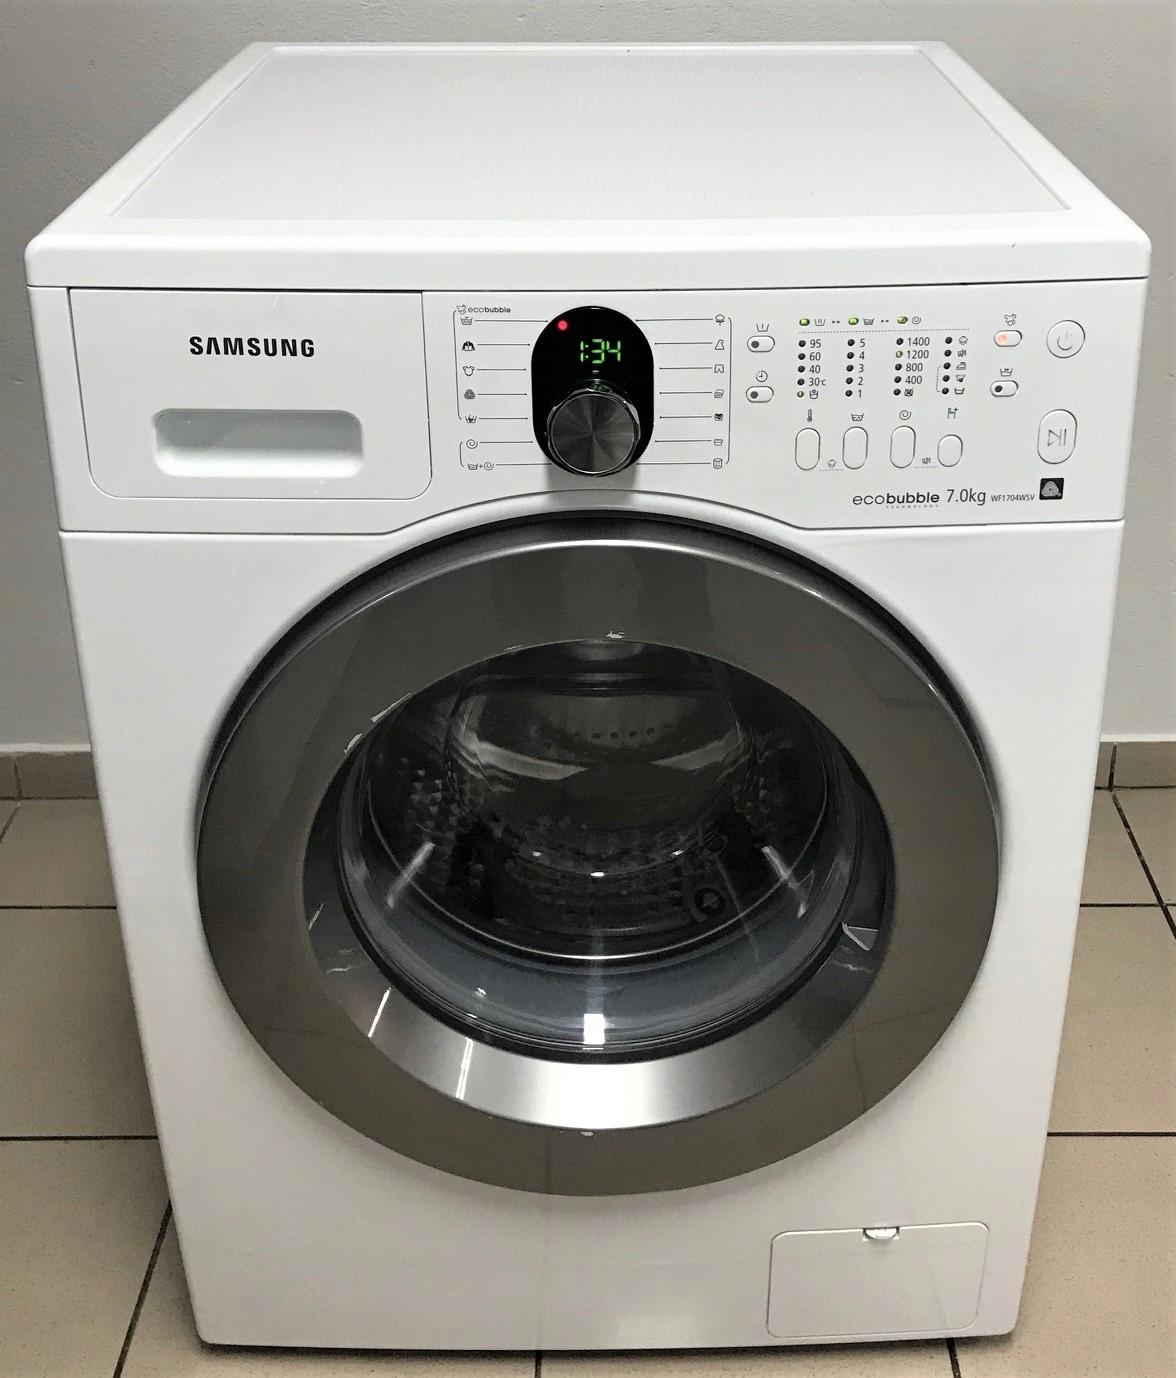 Pralka Samsung Eco Bubble 7kg A+++ 1400obr/min GW